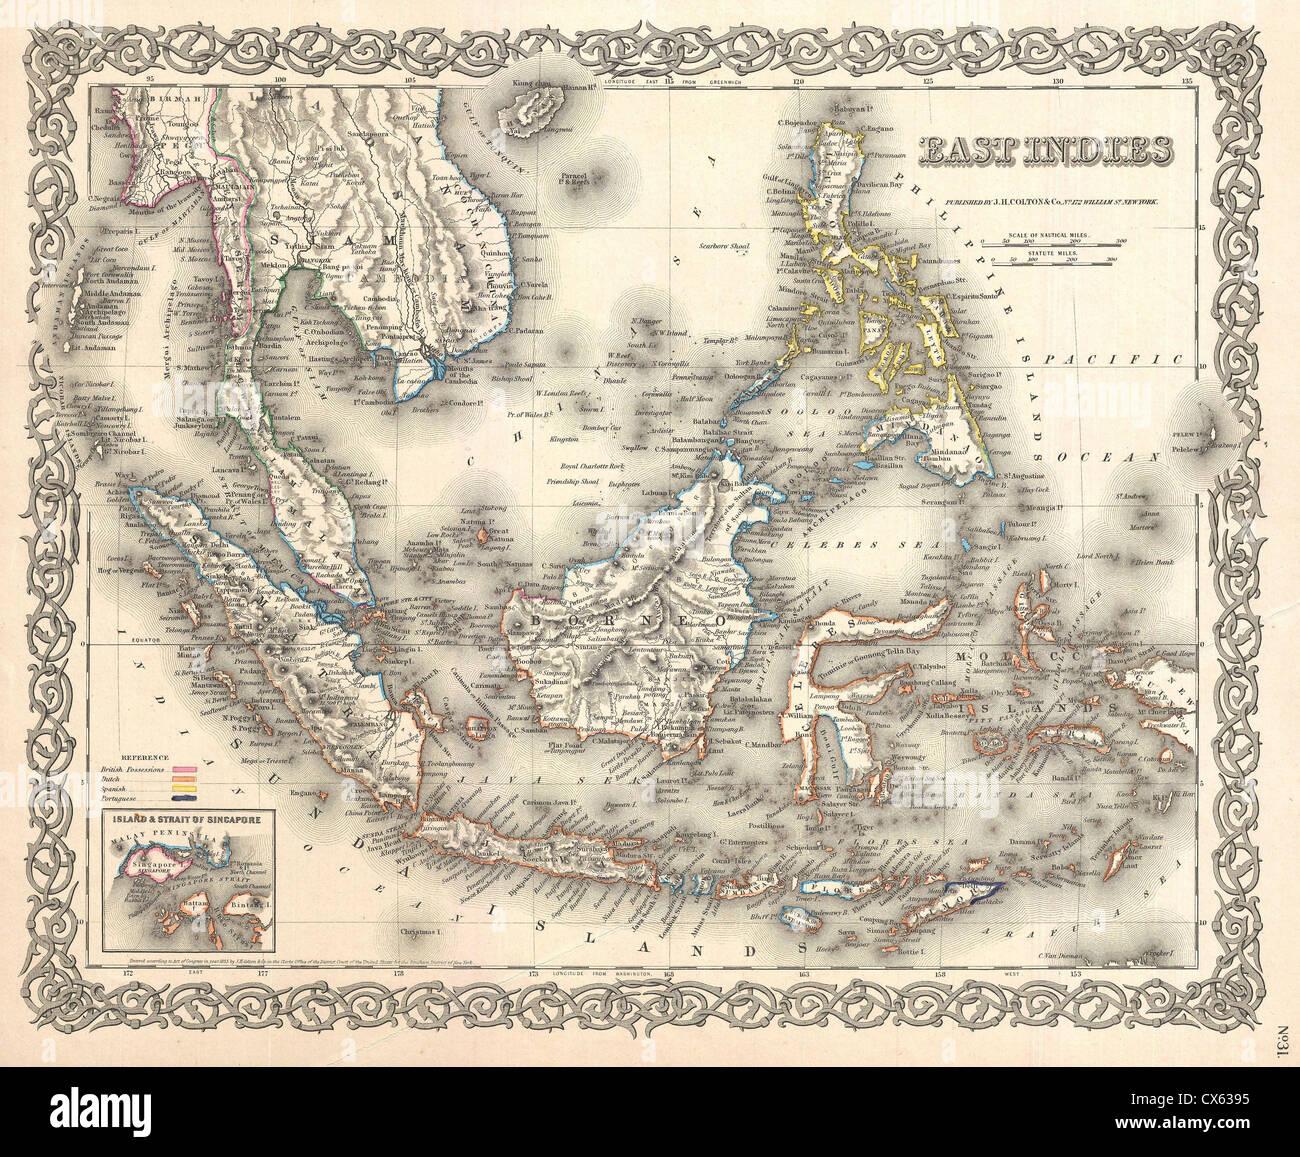 Map Singapore Stockfotos & Map Singapore Bilder - Alamy